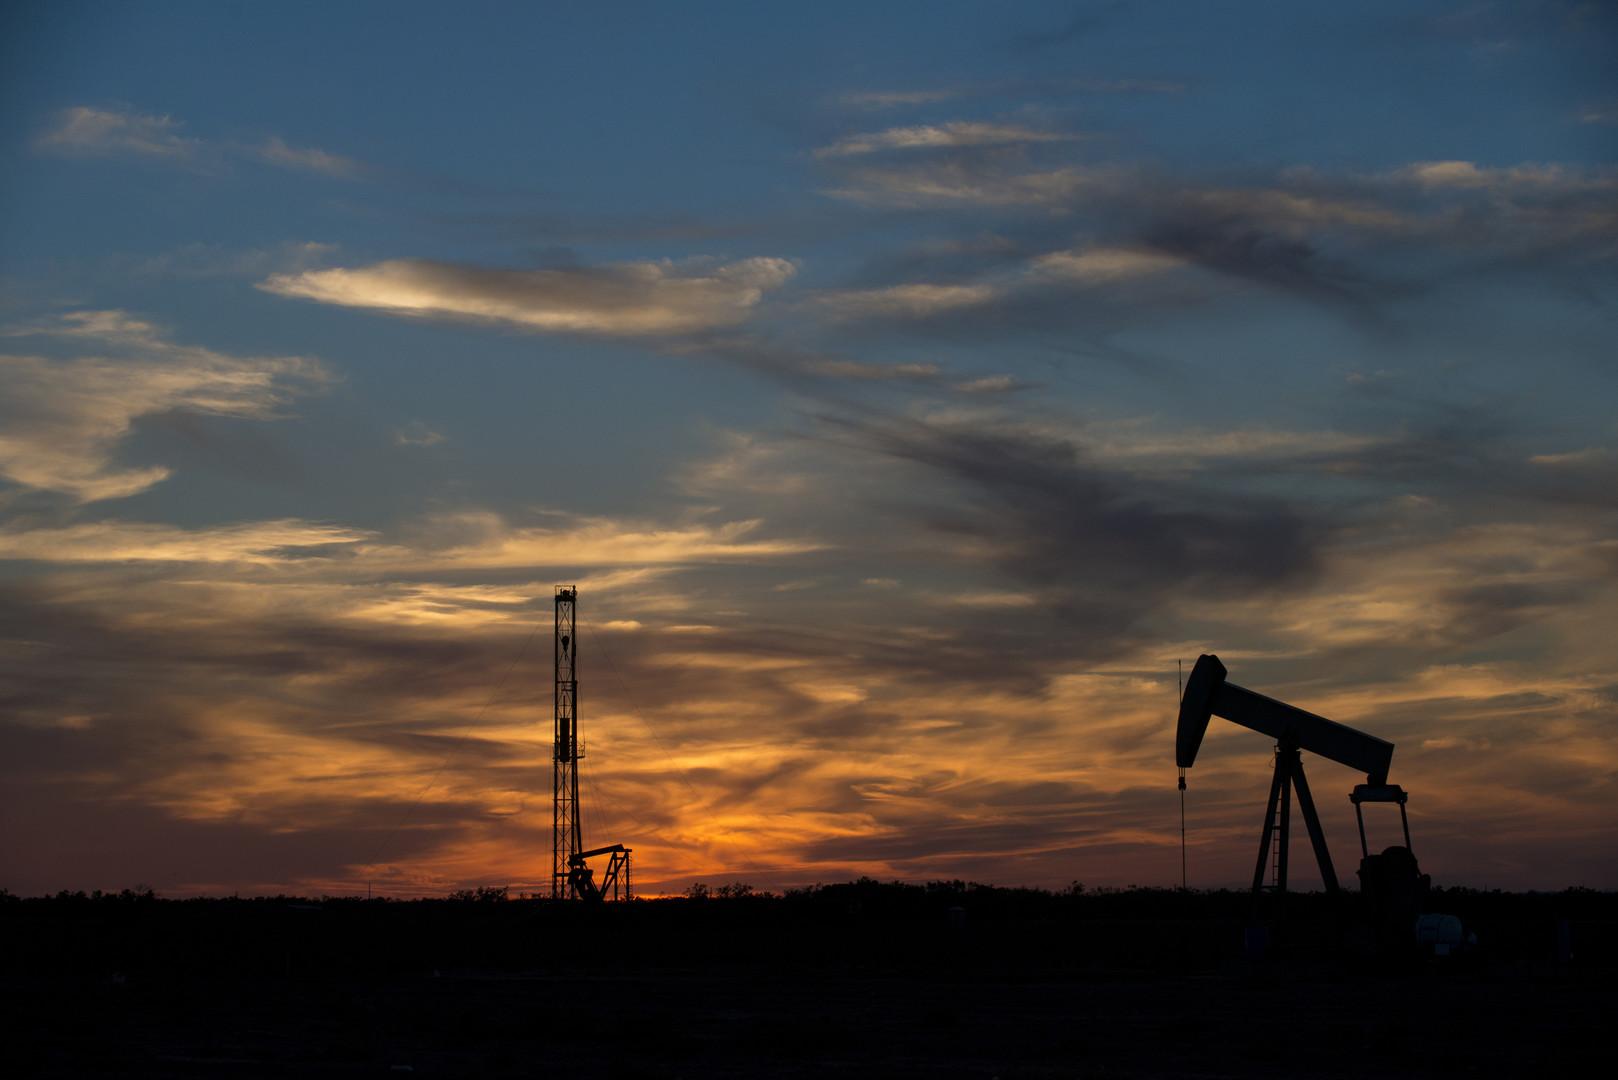 Добыча нефти странами ОПЕК приблизилась к максимуму 2008 года